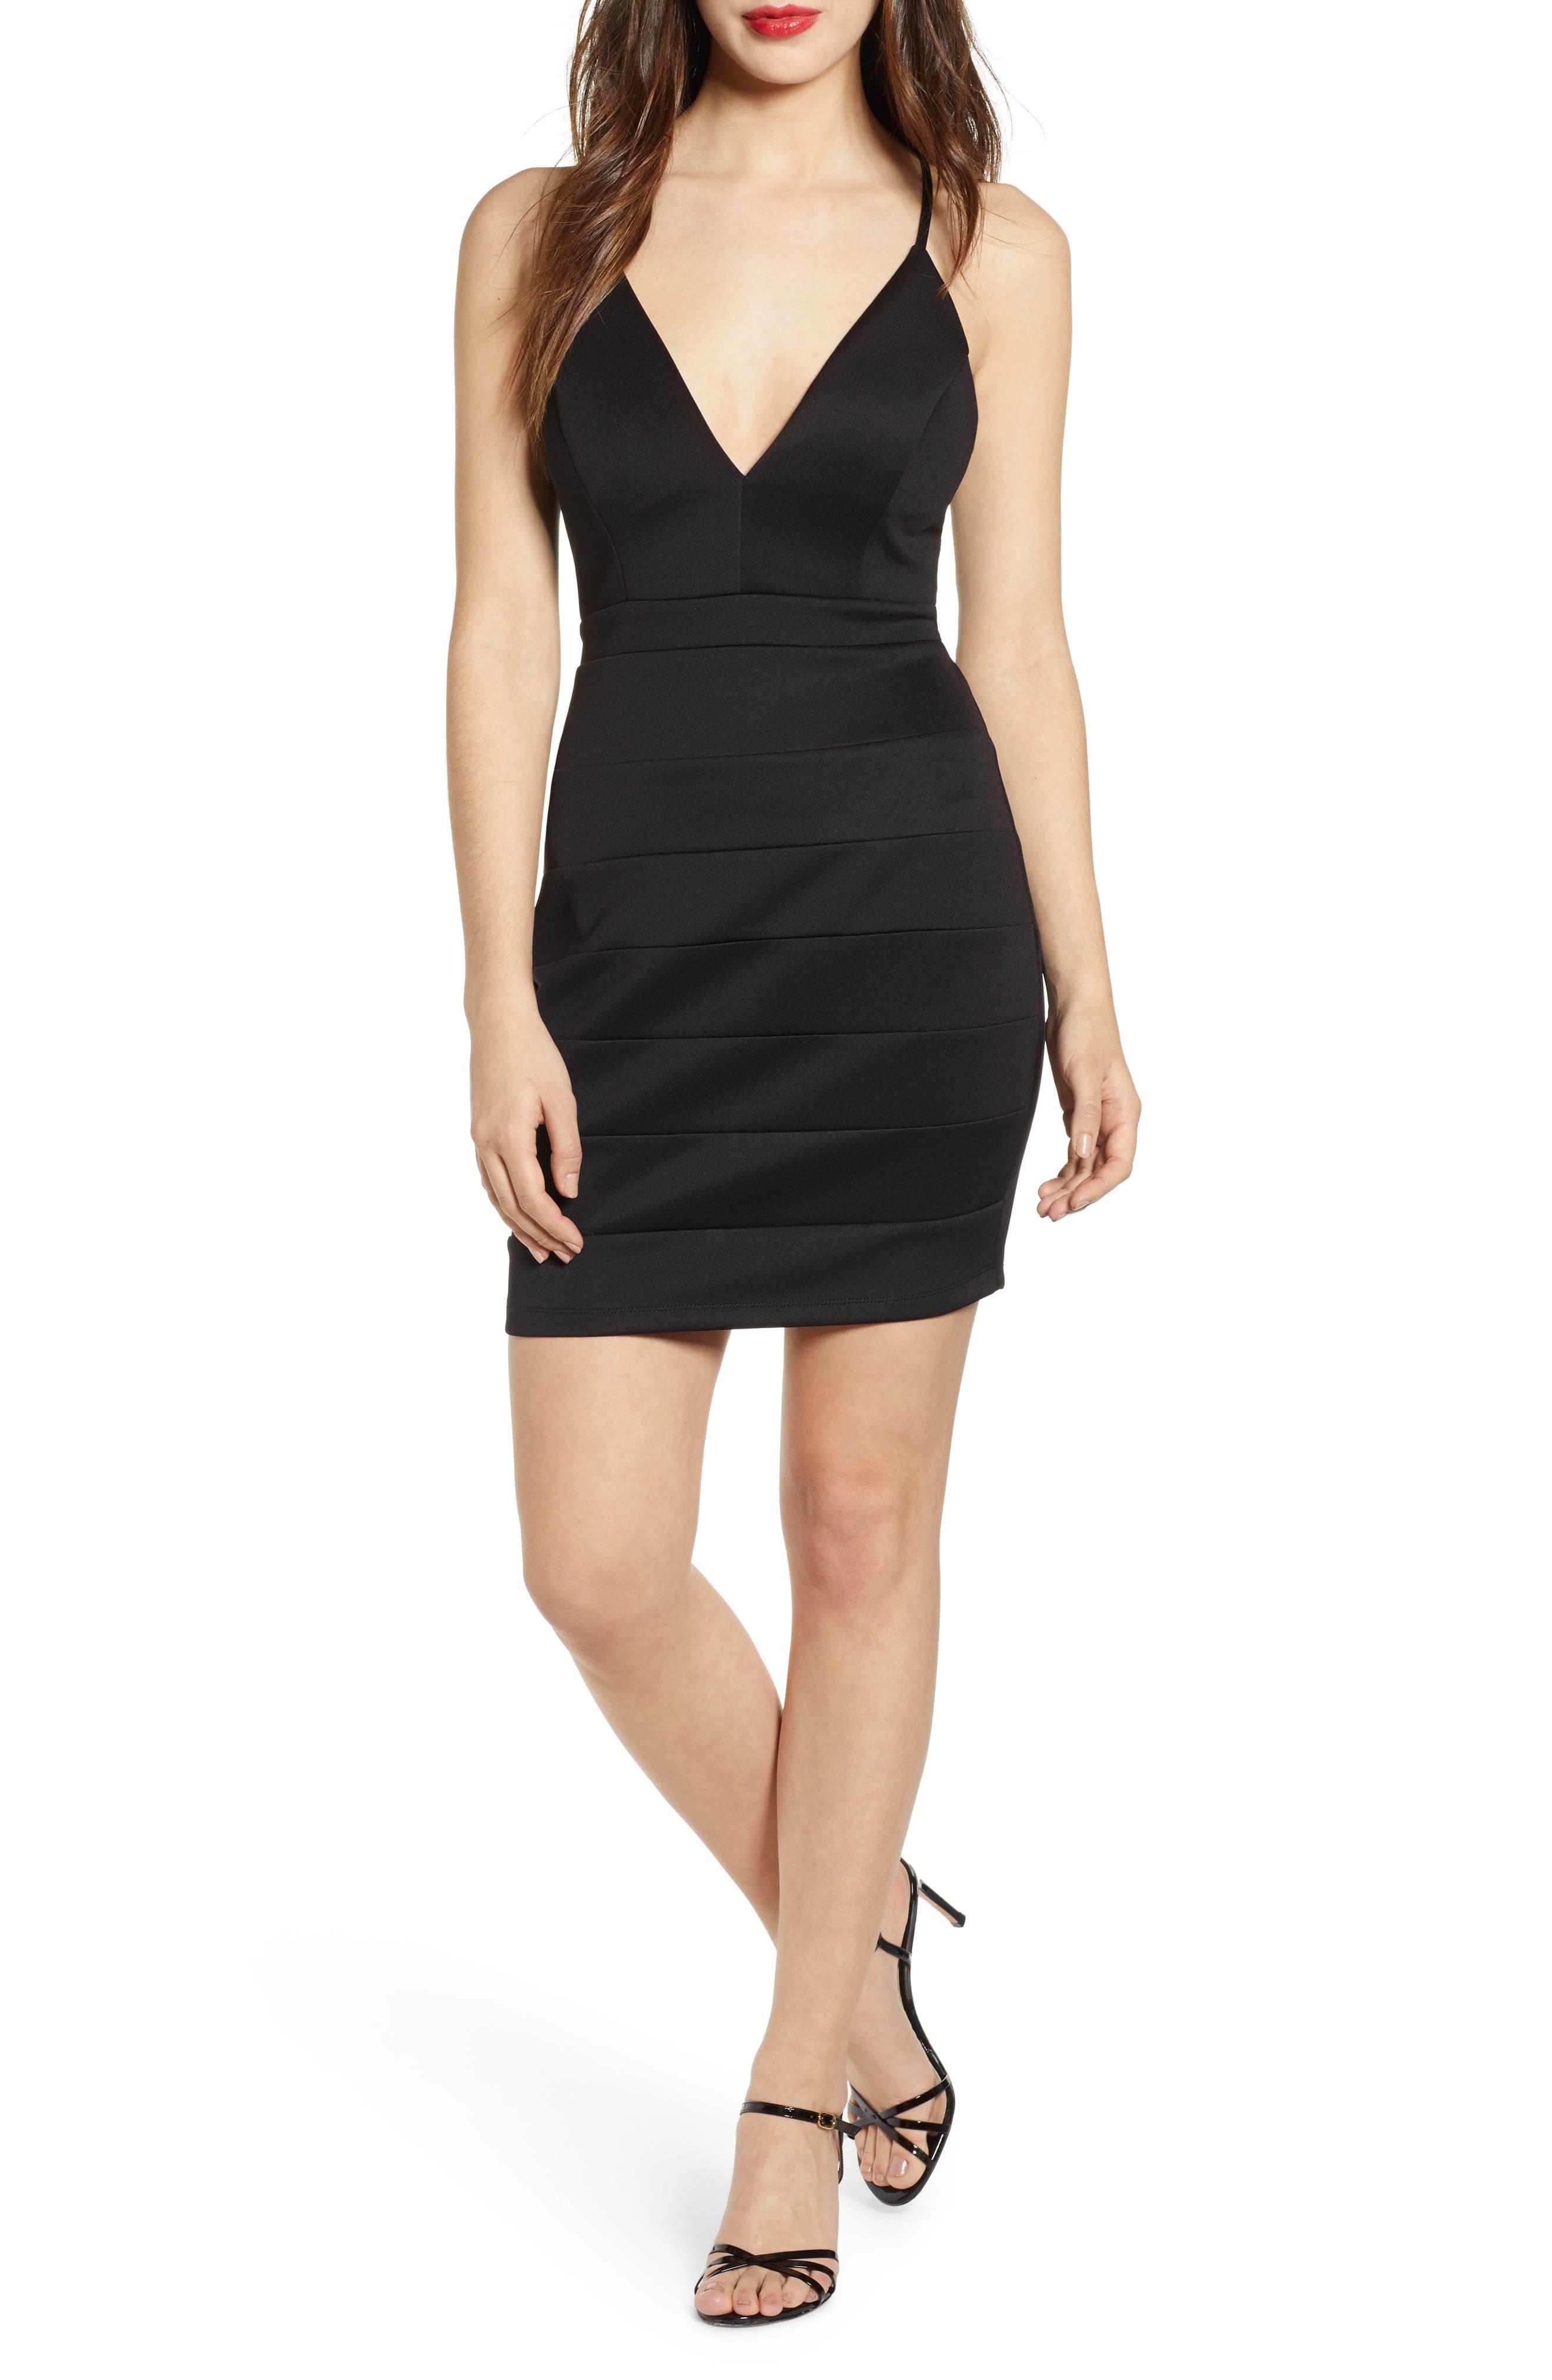 Love, Nickie Lew Lace Detail Body-Con Dress, Black